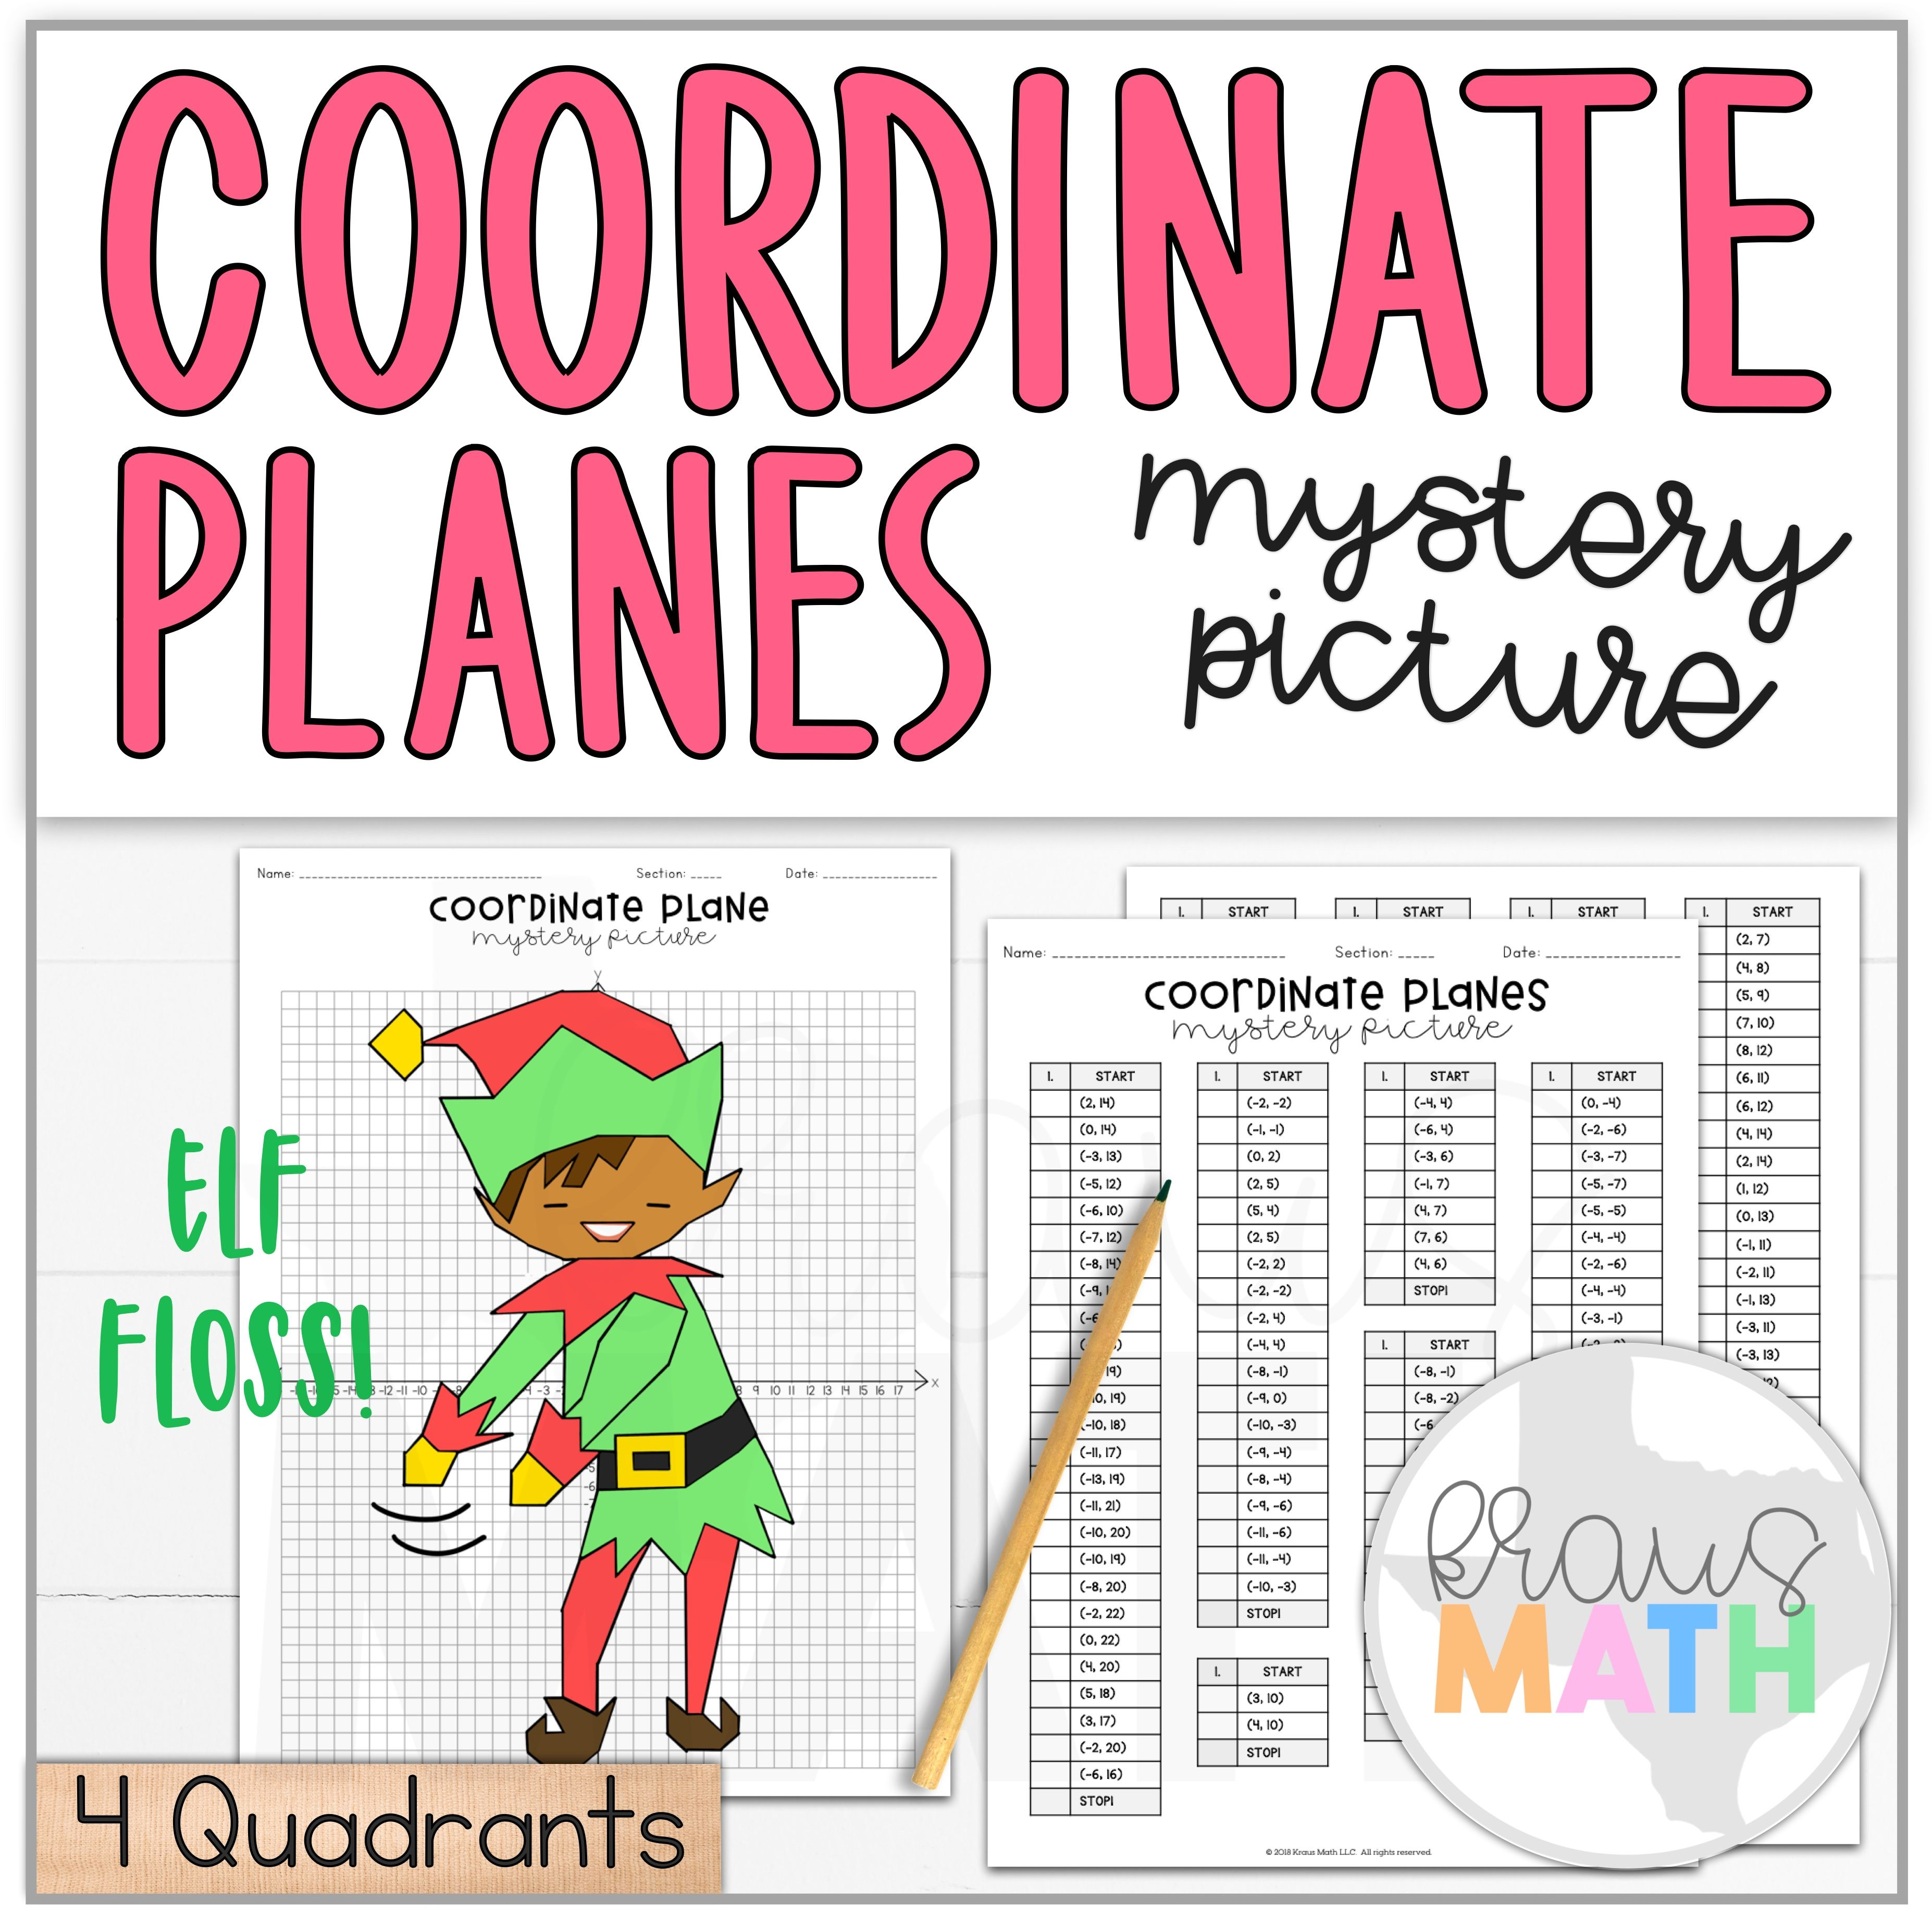 Elf Floss Dance Coordinate Plane Activity (4 Quadrants)   Kraus Math  *Christmas/Winter Activity…   Coordinate plane activity [ 3692 x 3708 Pixel ]